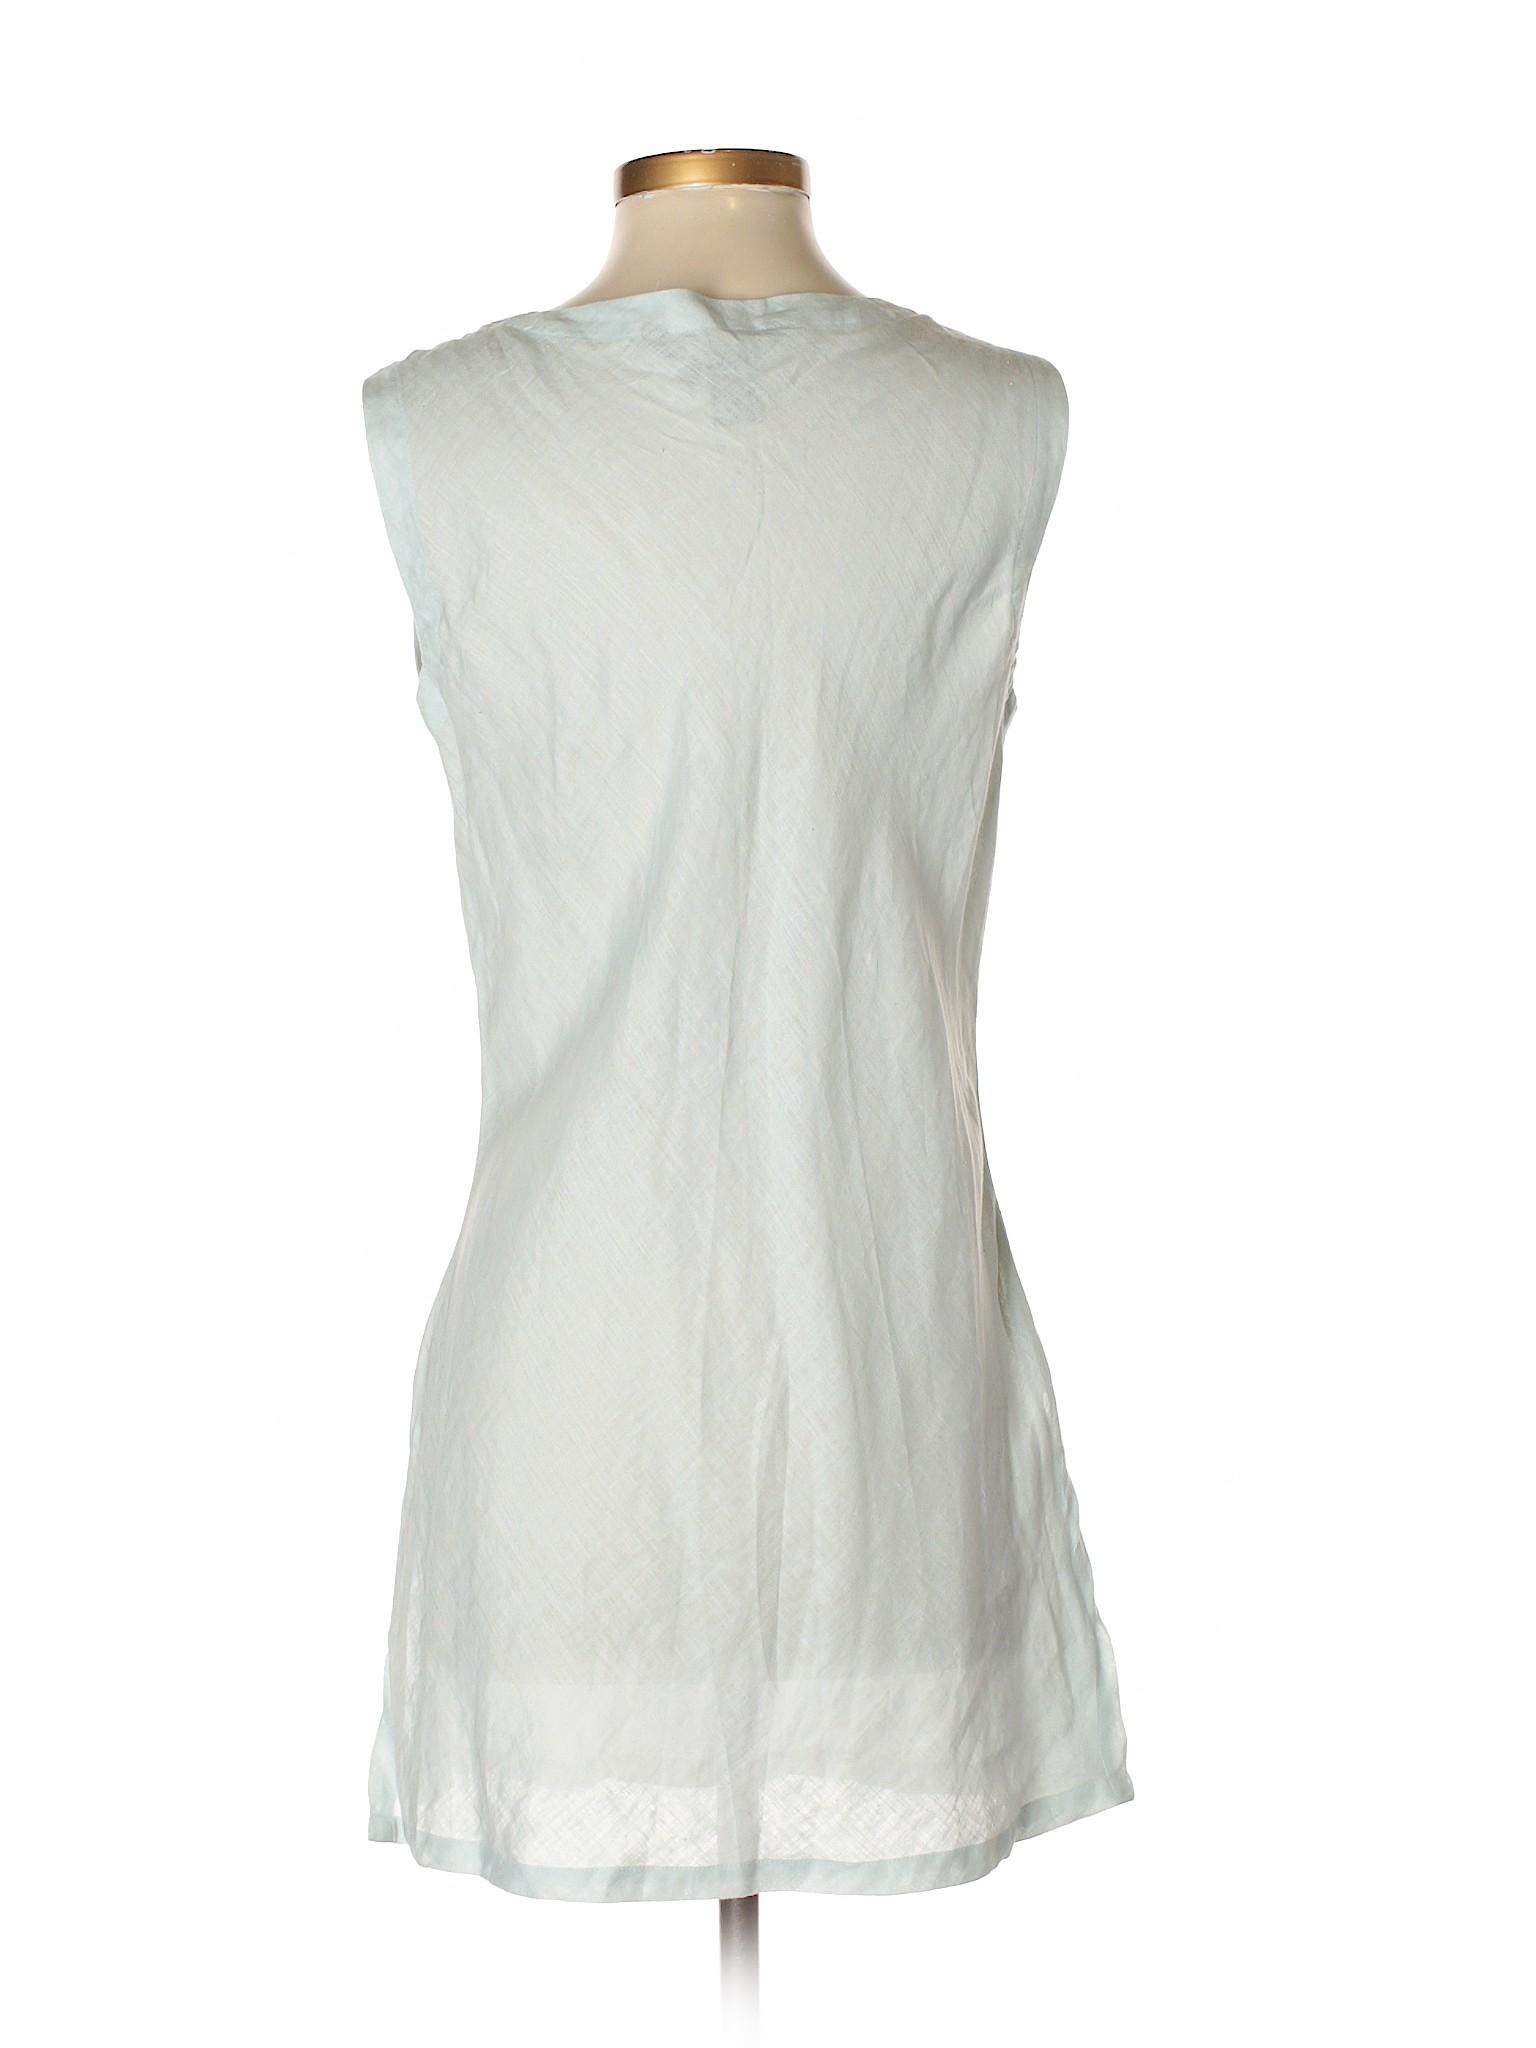 Ishyu Selling Casual Selling Dress Ishyu g0z7q7